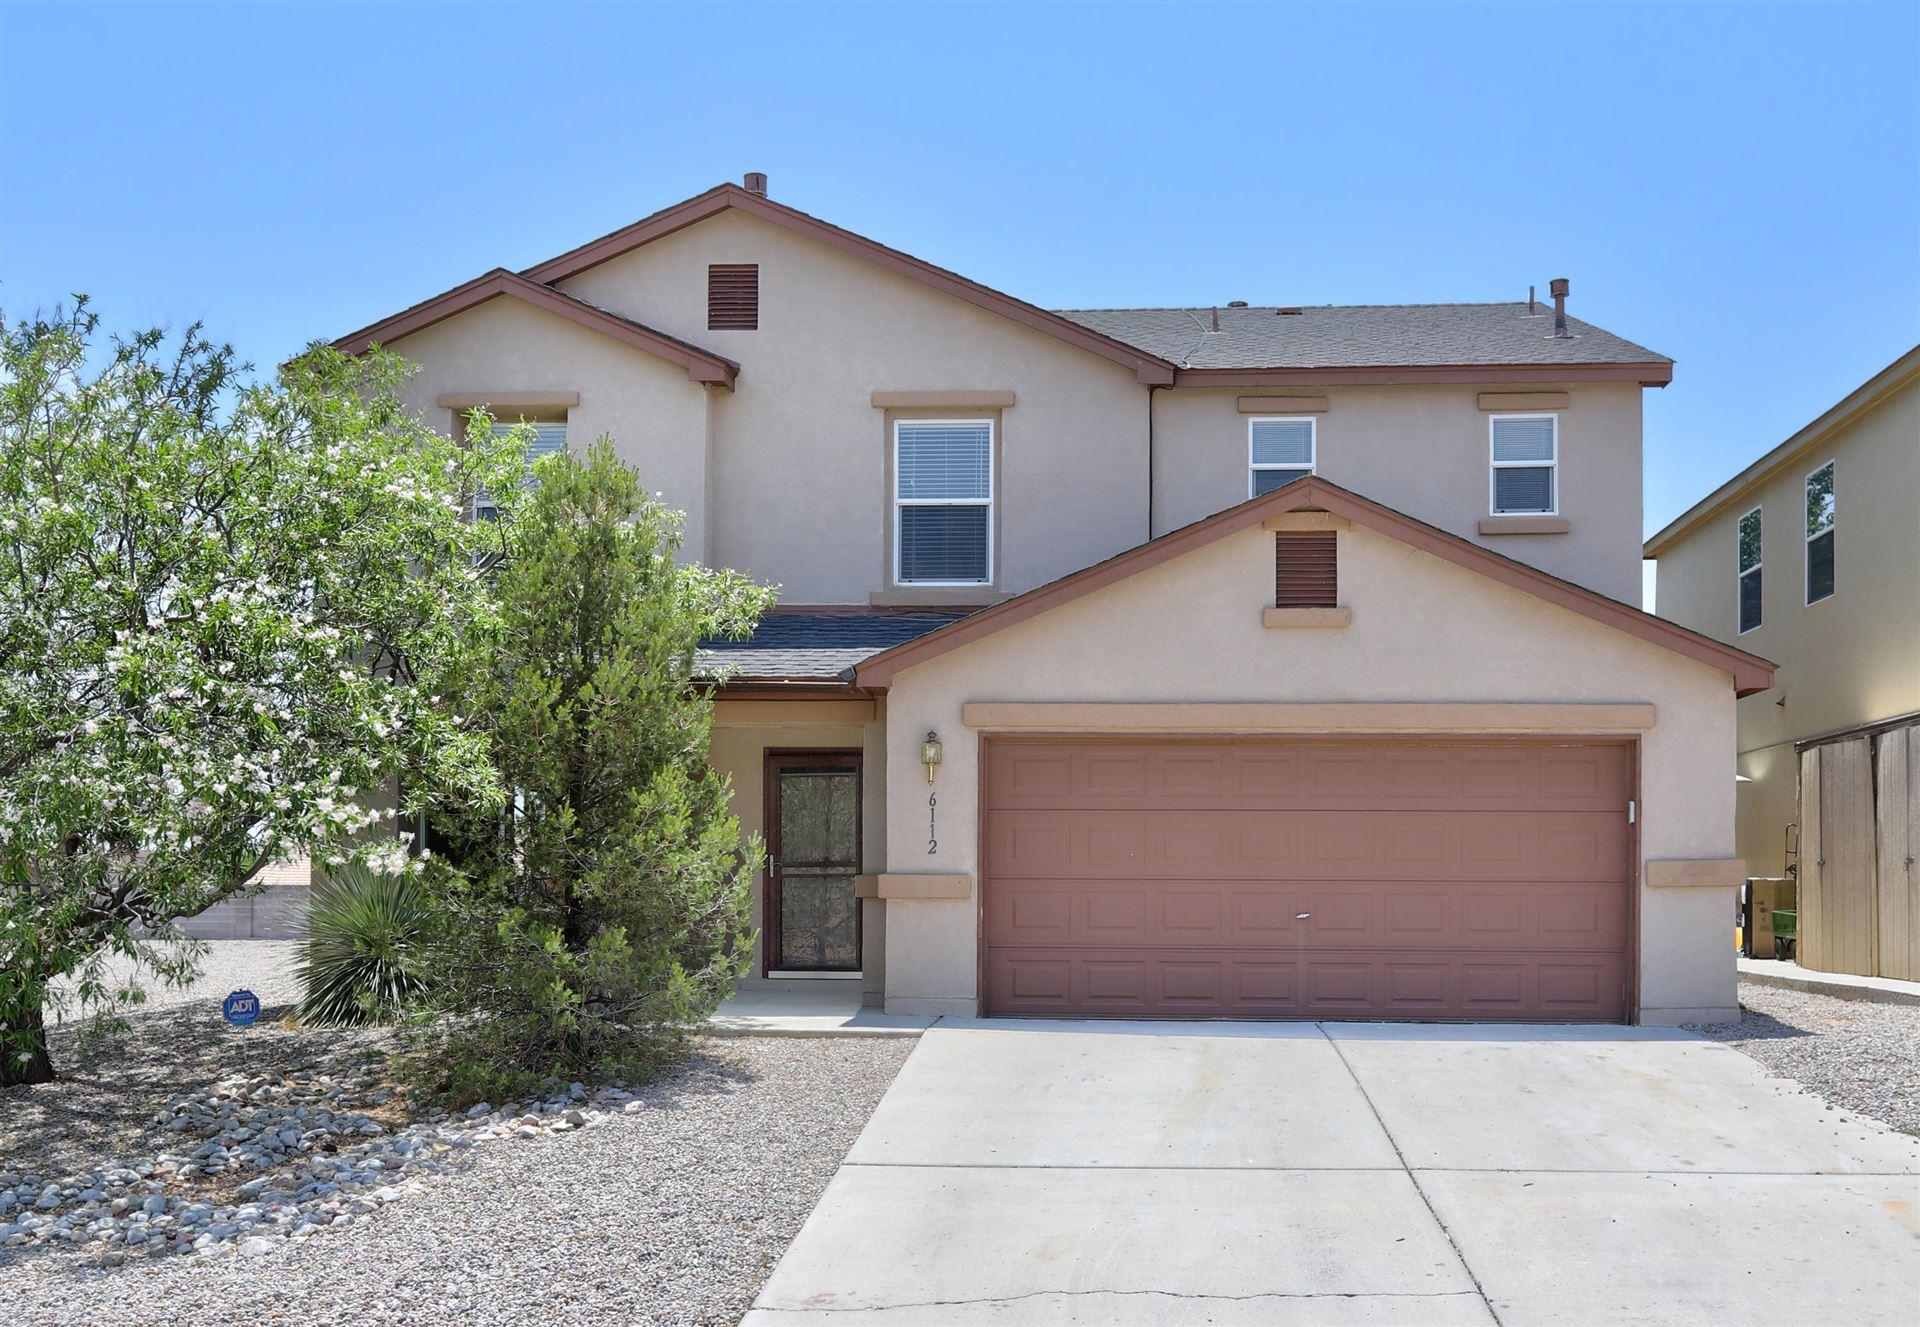 Photo of 6112 CROWNPOINT Drive NE, Rio Rancho, NM 87144 (MLS # 994799)